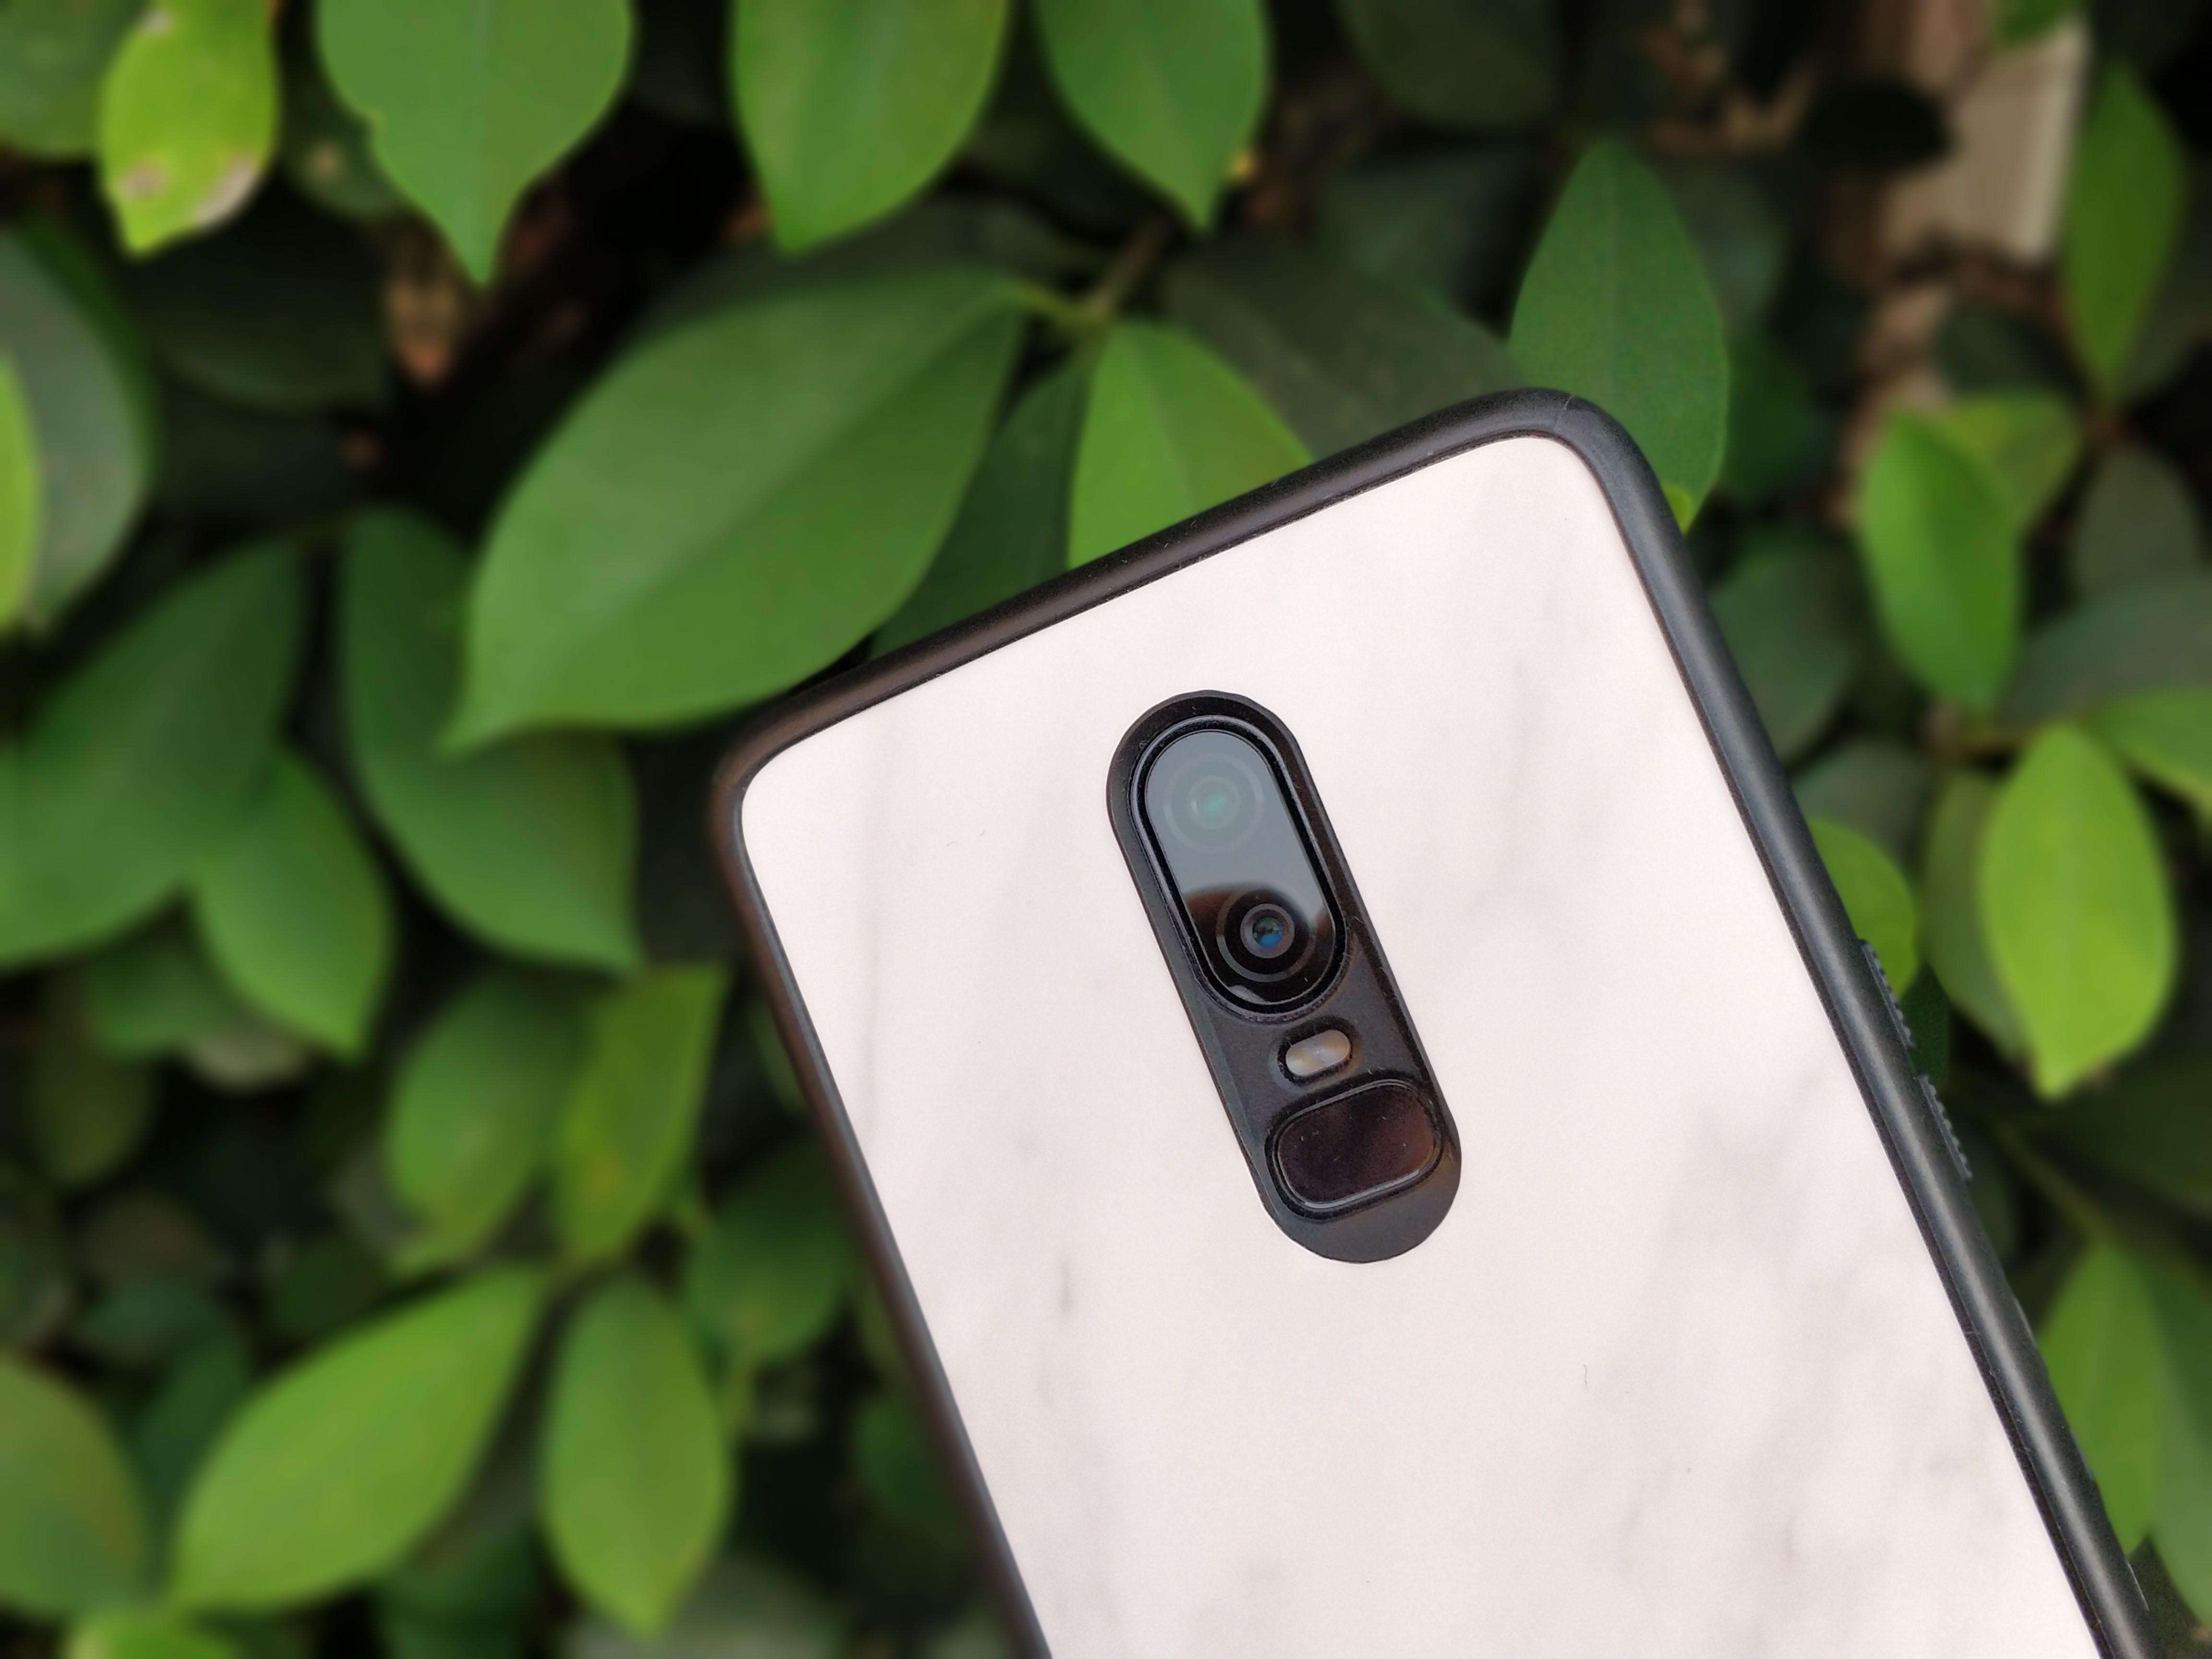 dbrand Grip v2 phone case review - Pixel Spot